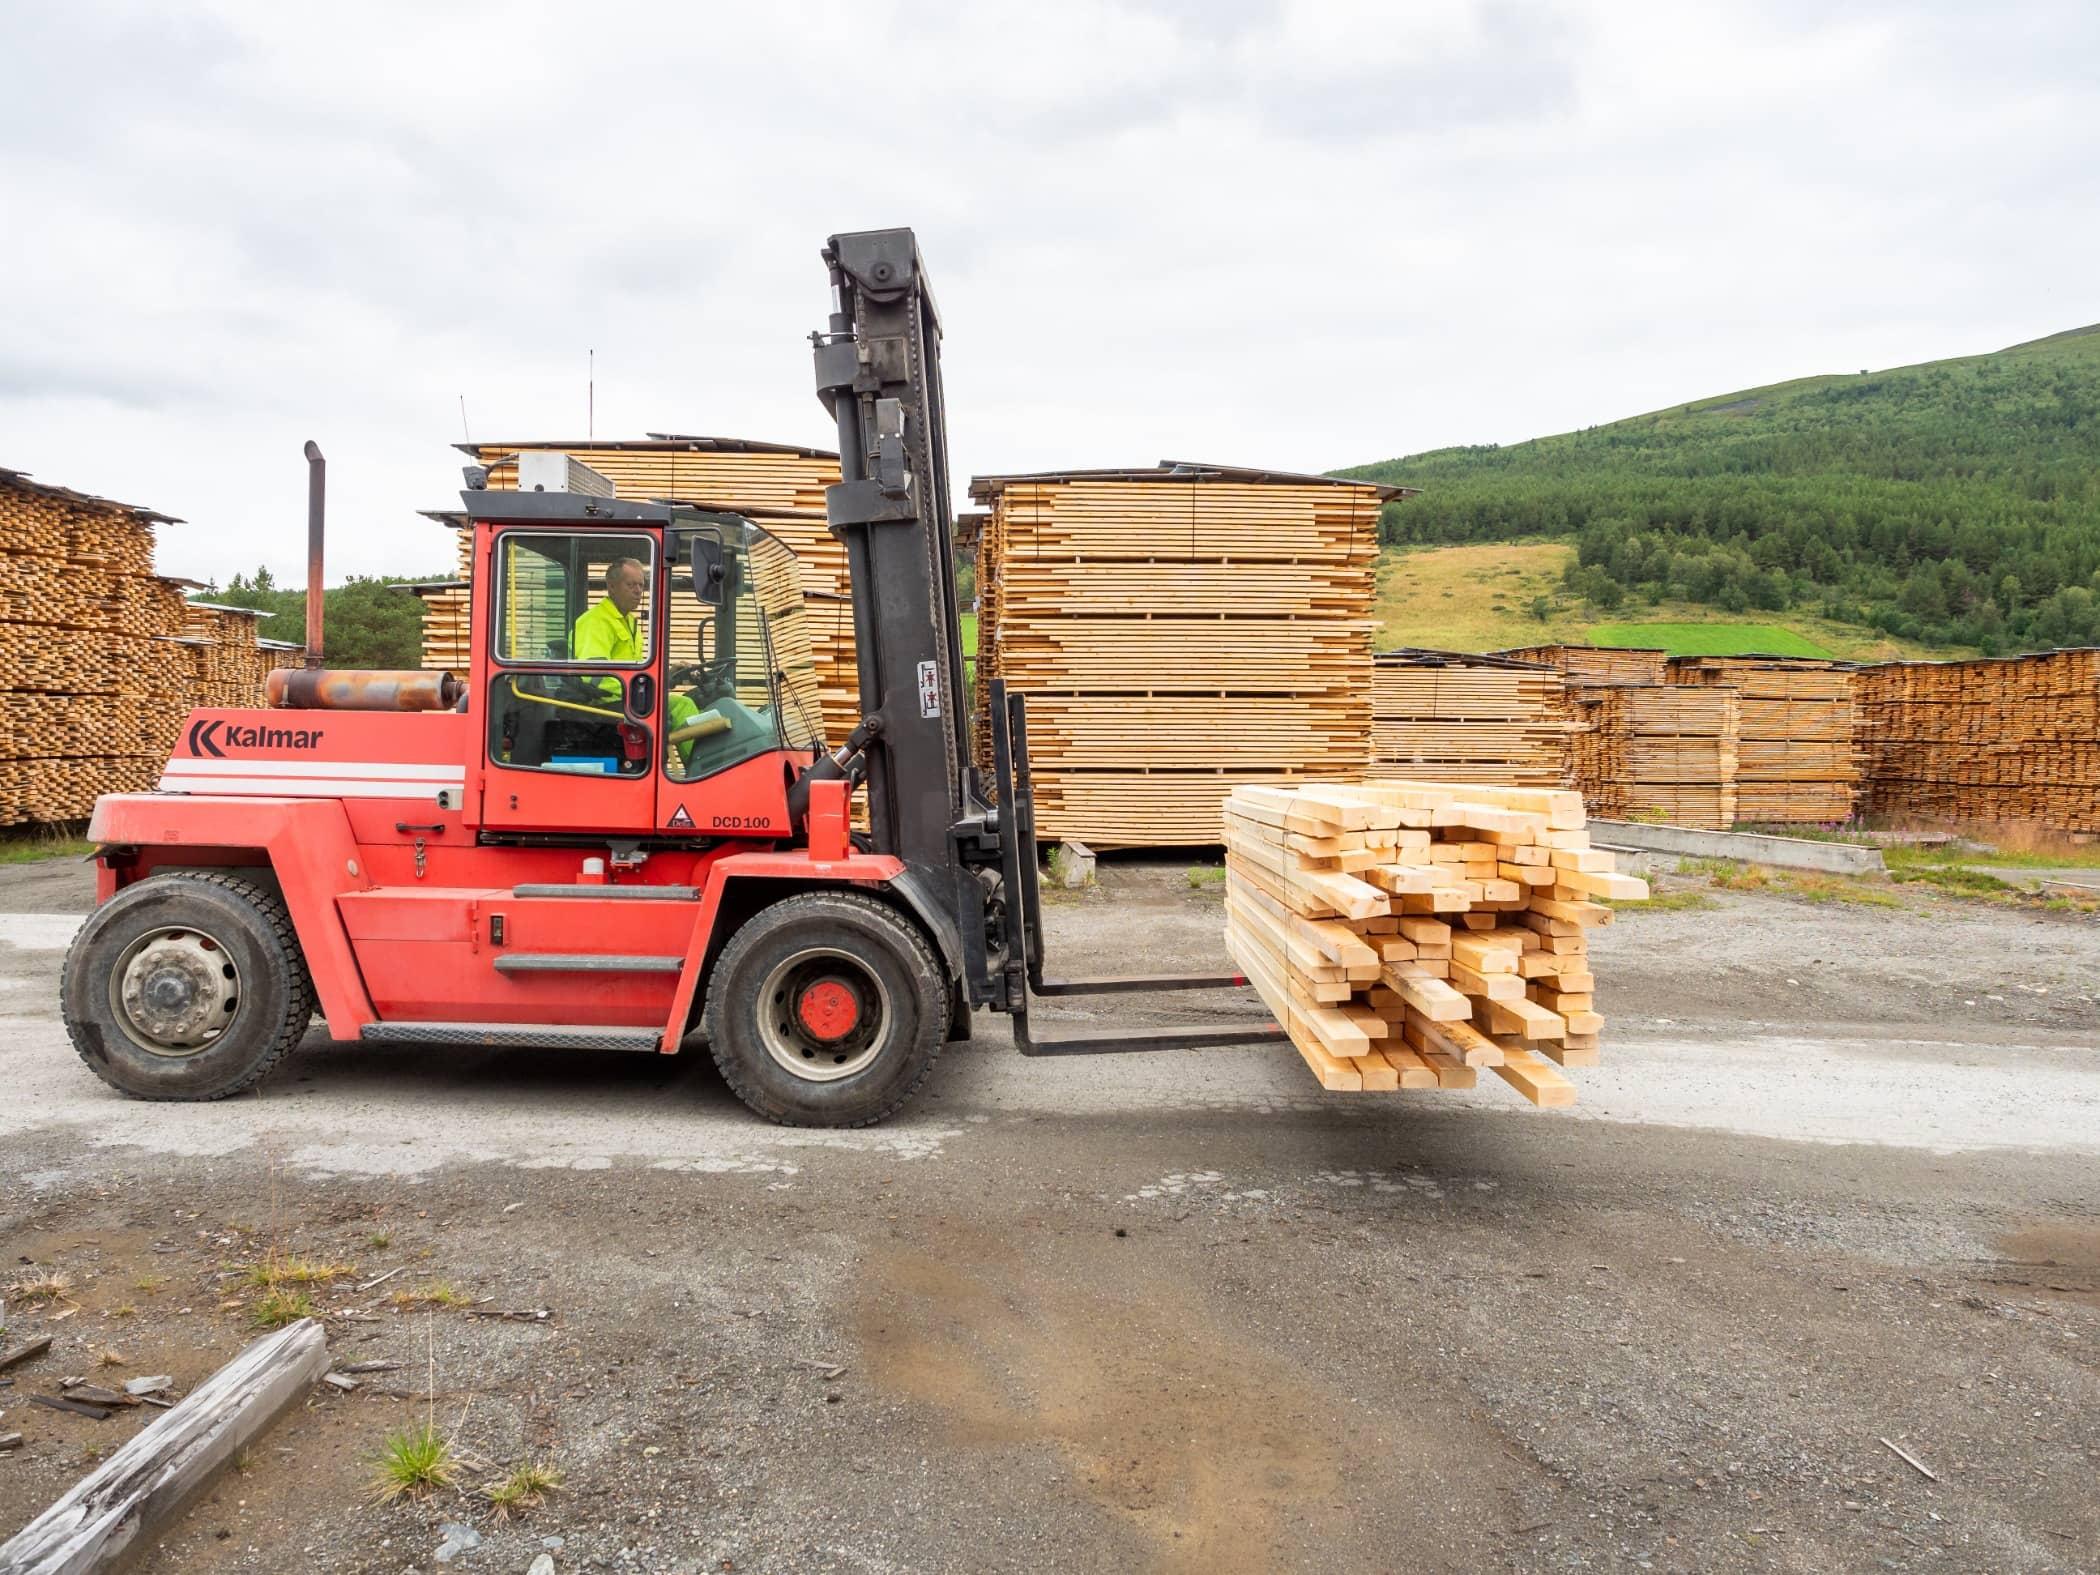 Automotive tire, Forklift truck, Wood, Vehicle, Transport